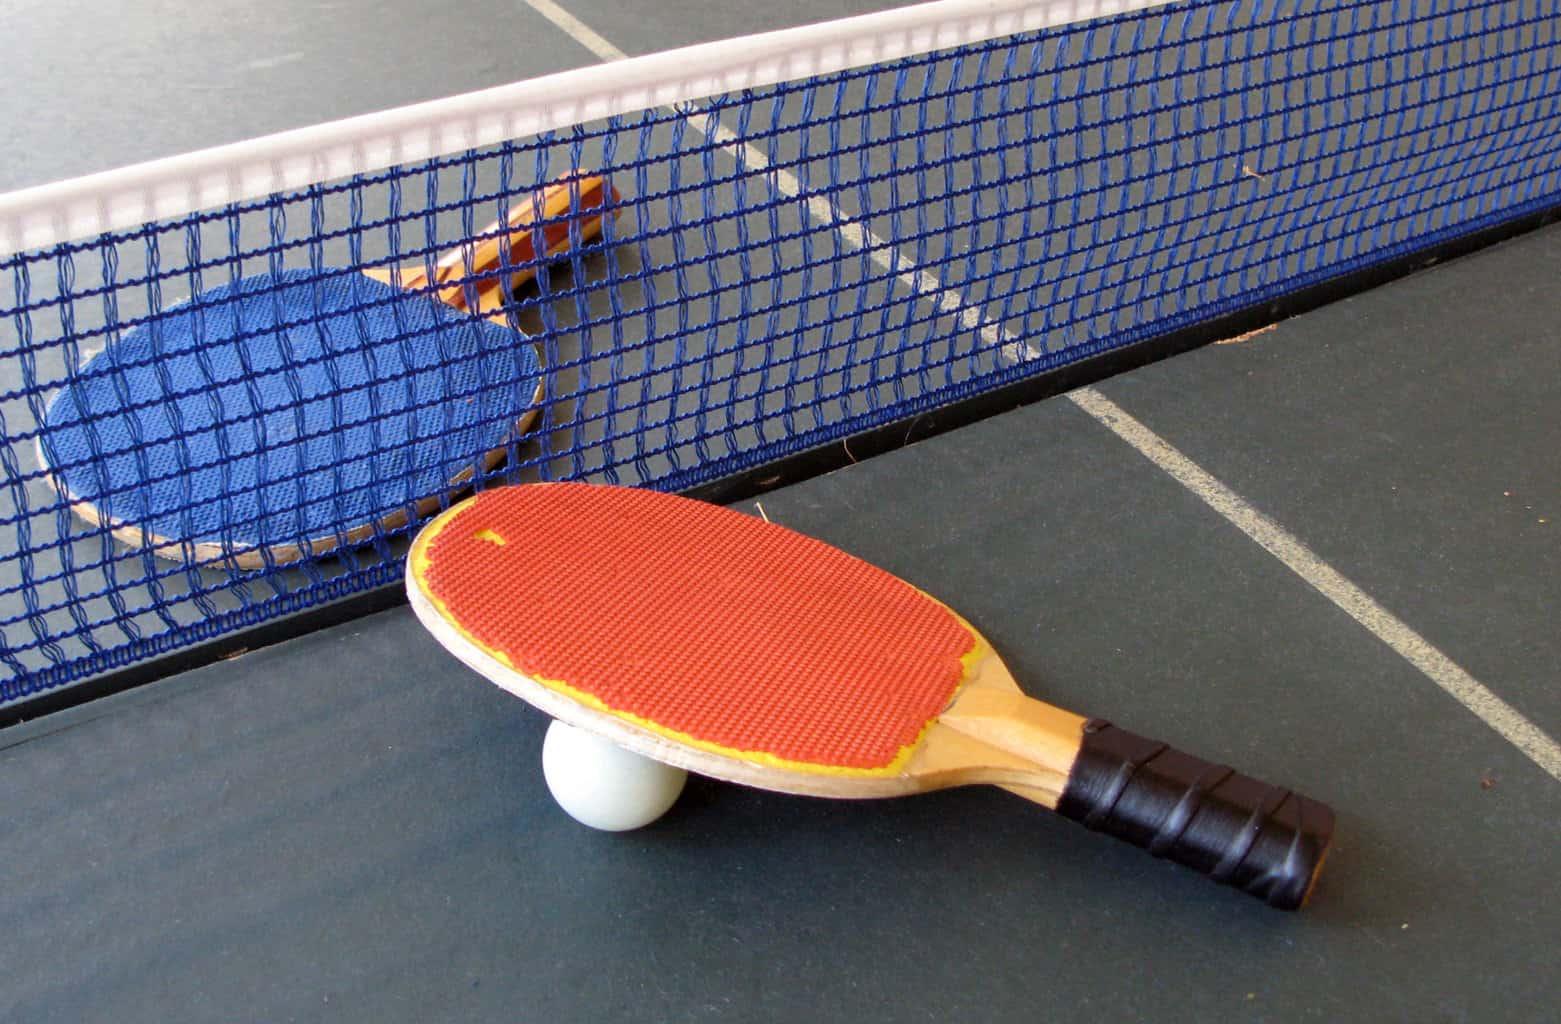 Table_tennis-bats